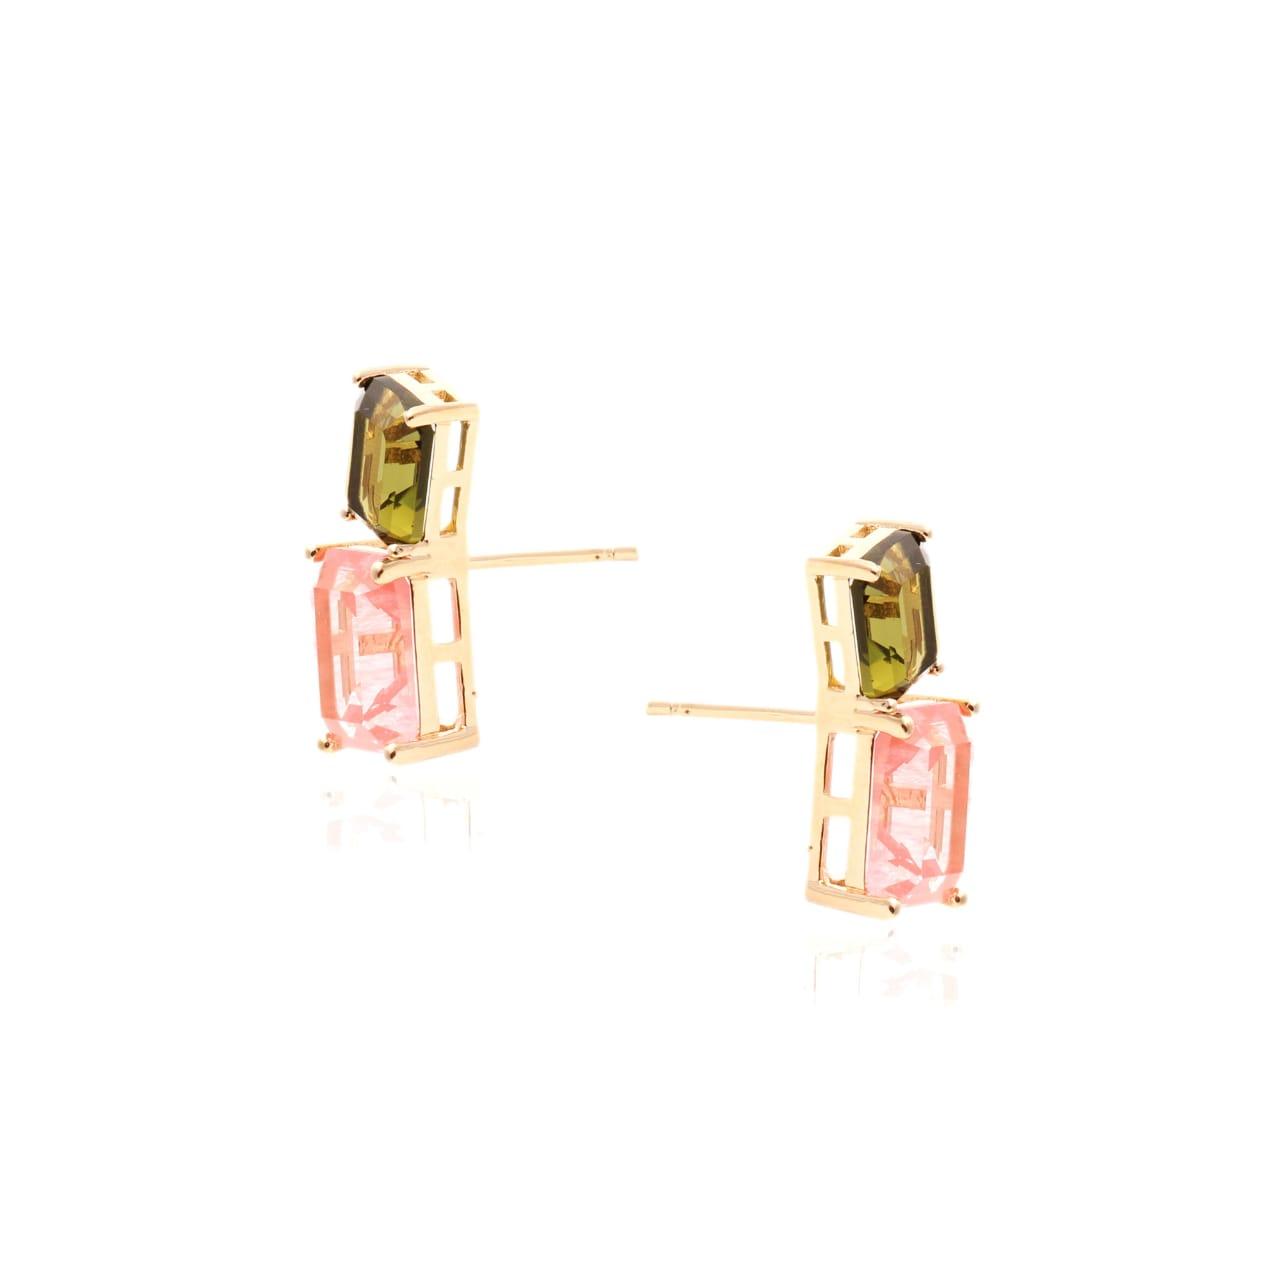 Brinco Fusion Morganita e Cristal Peridoto Ear Cuff com Fecho de Pérola